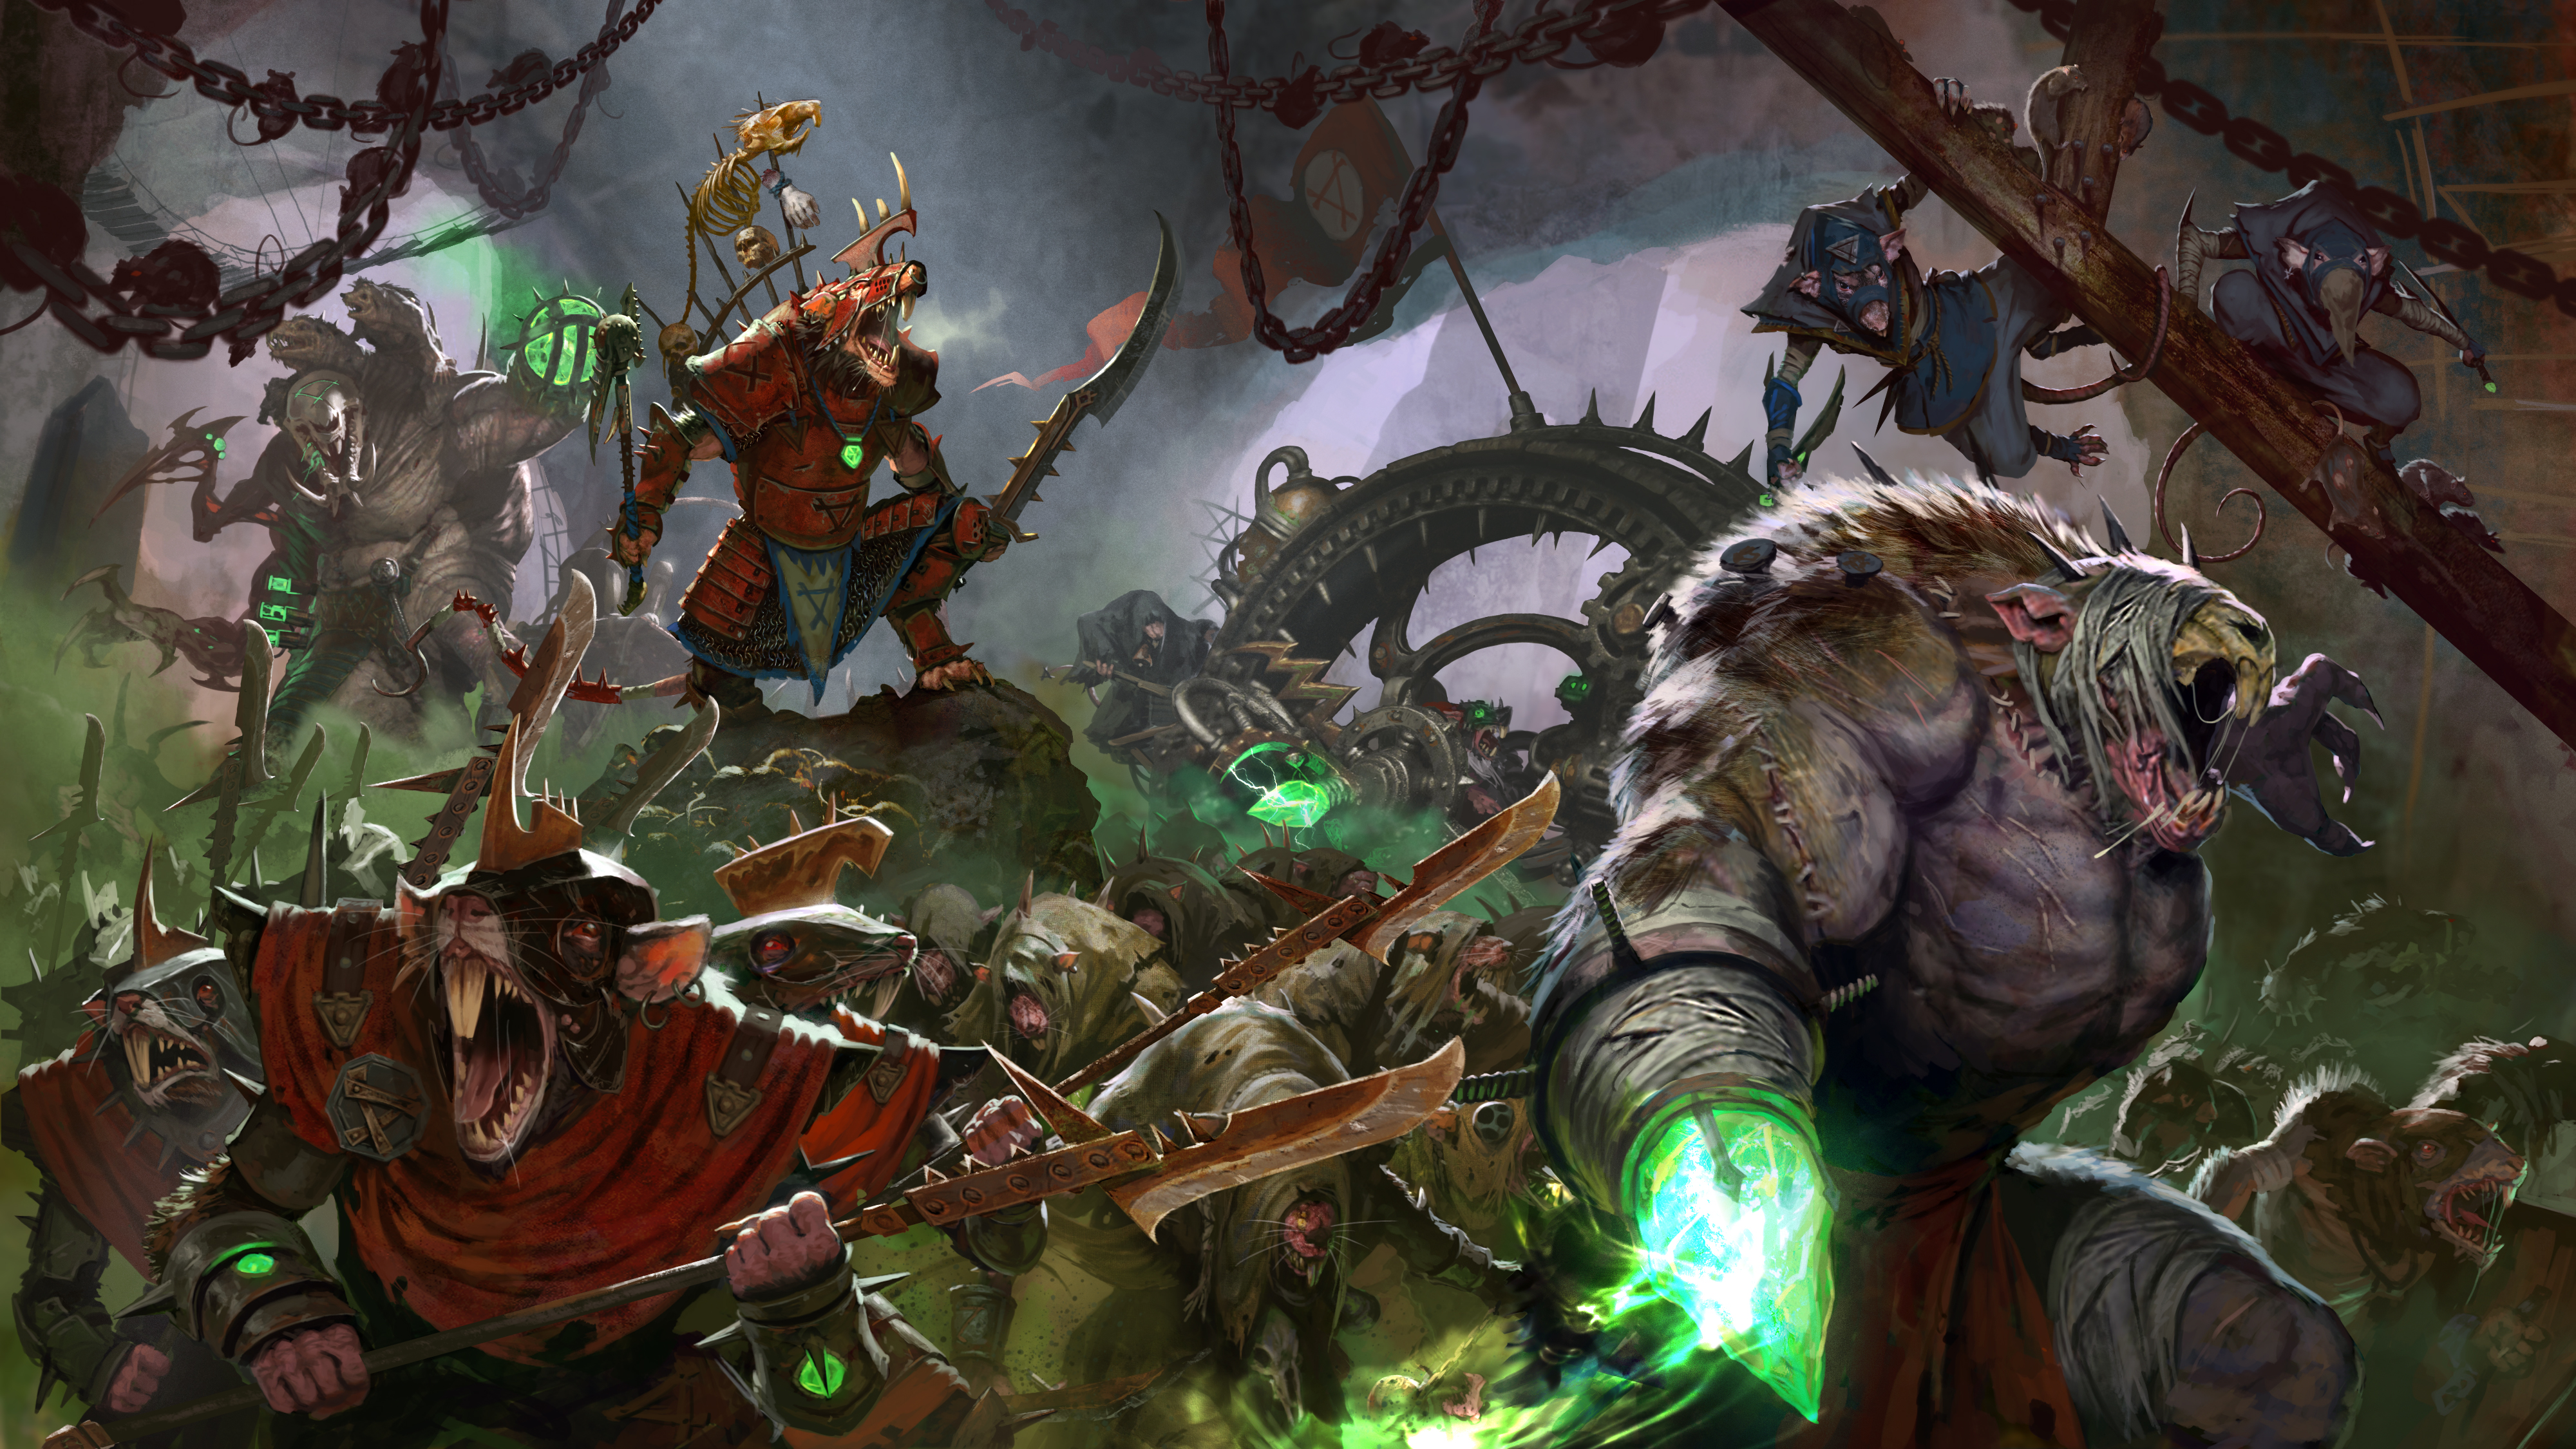 Total War Warhammer II 4k Ultra HD Wallpaper Background Image 4000x2250